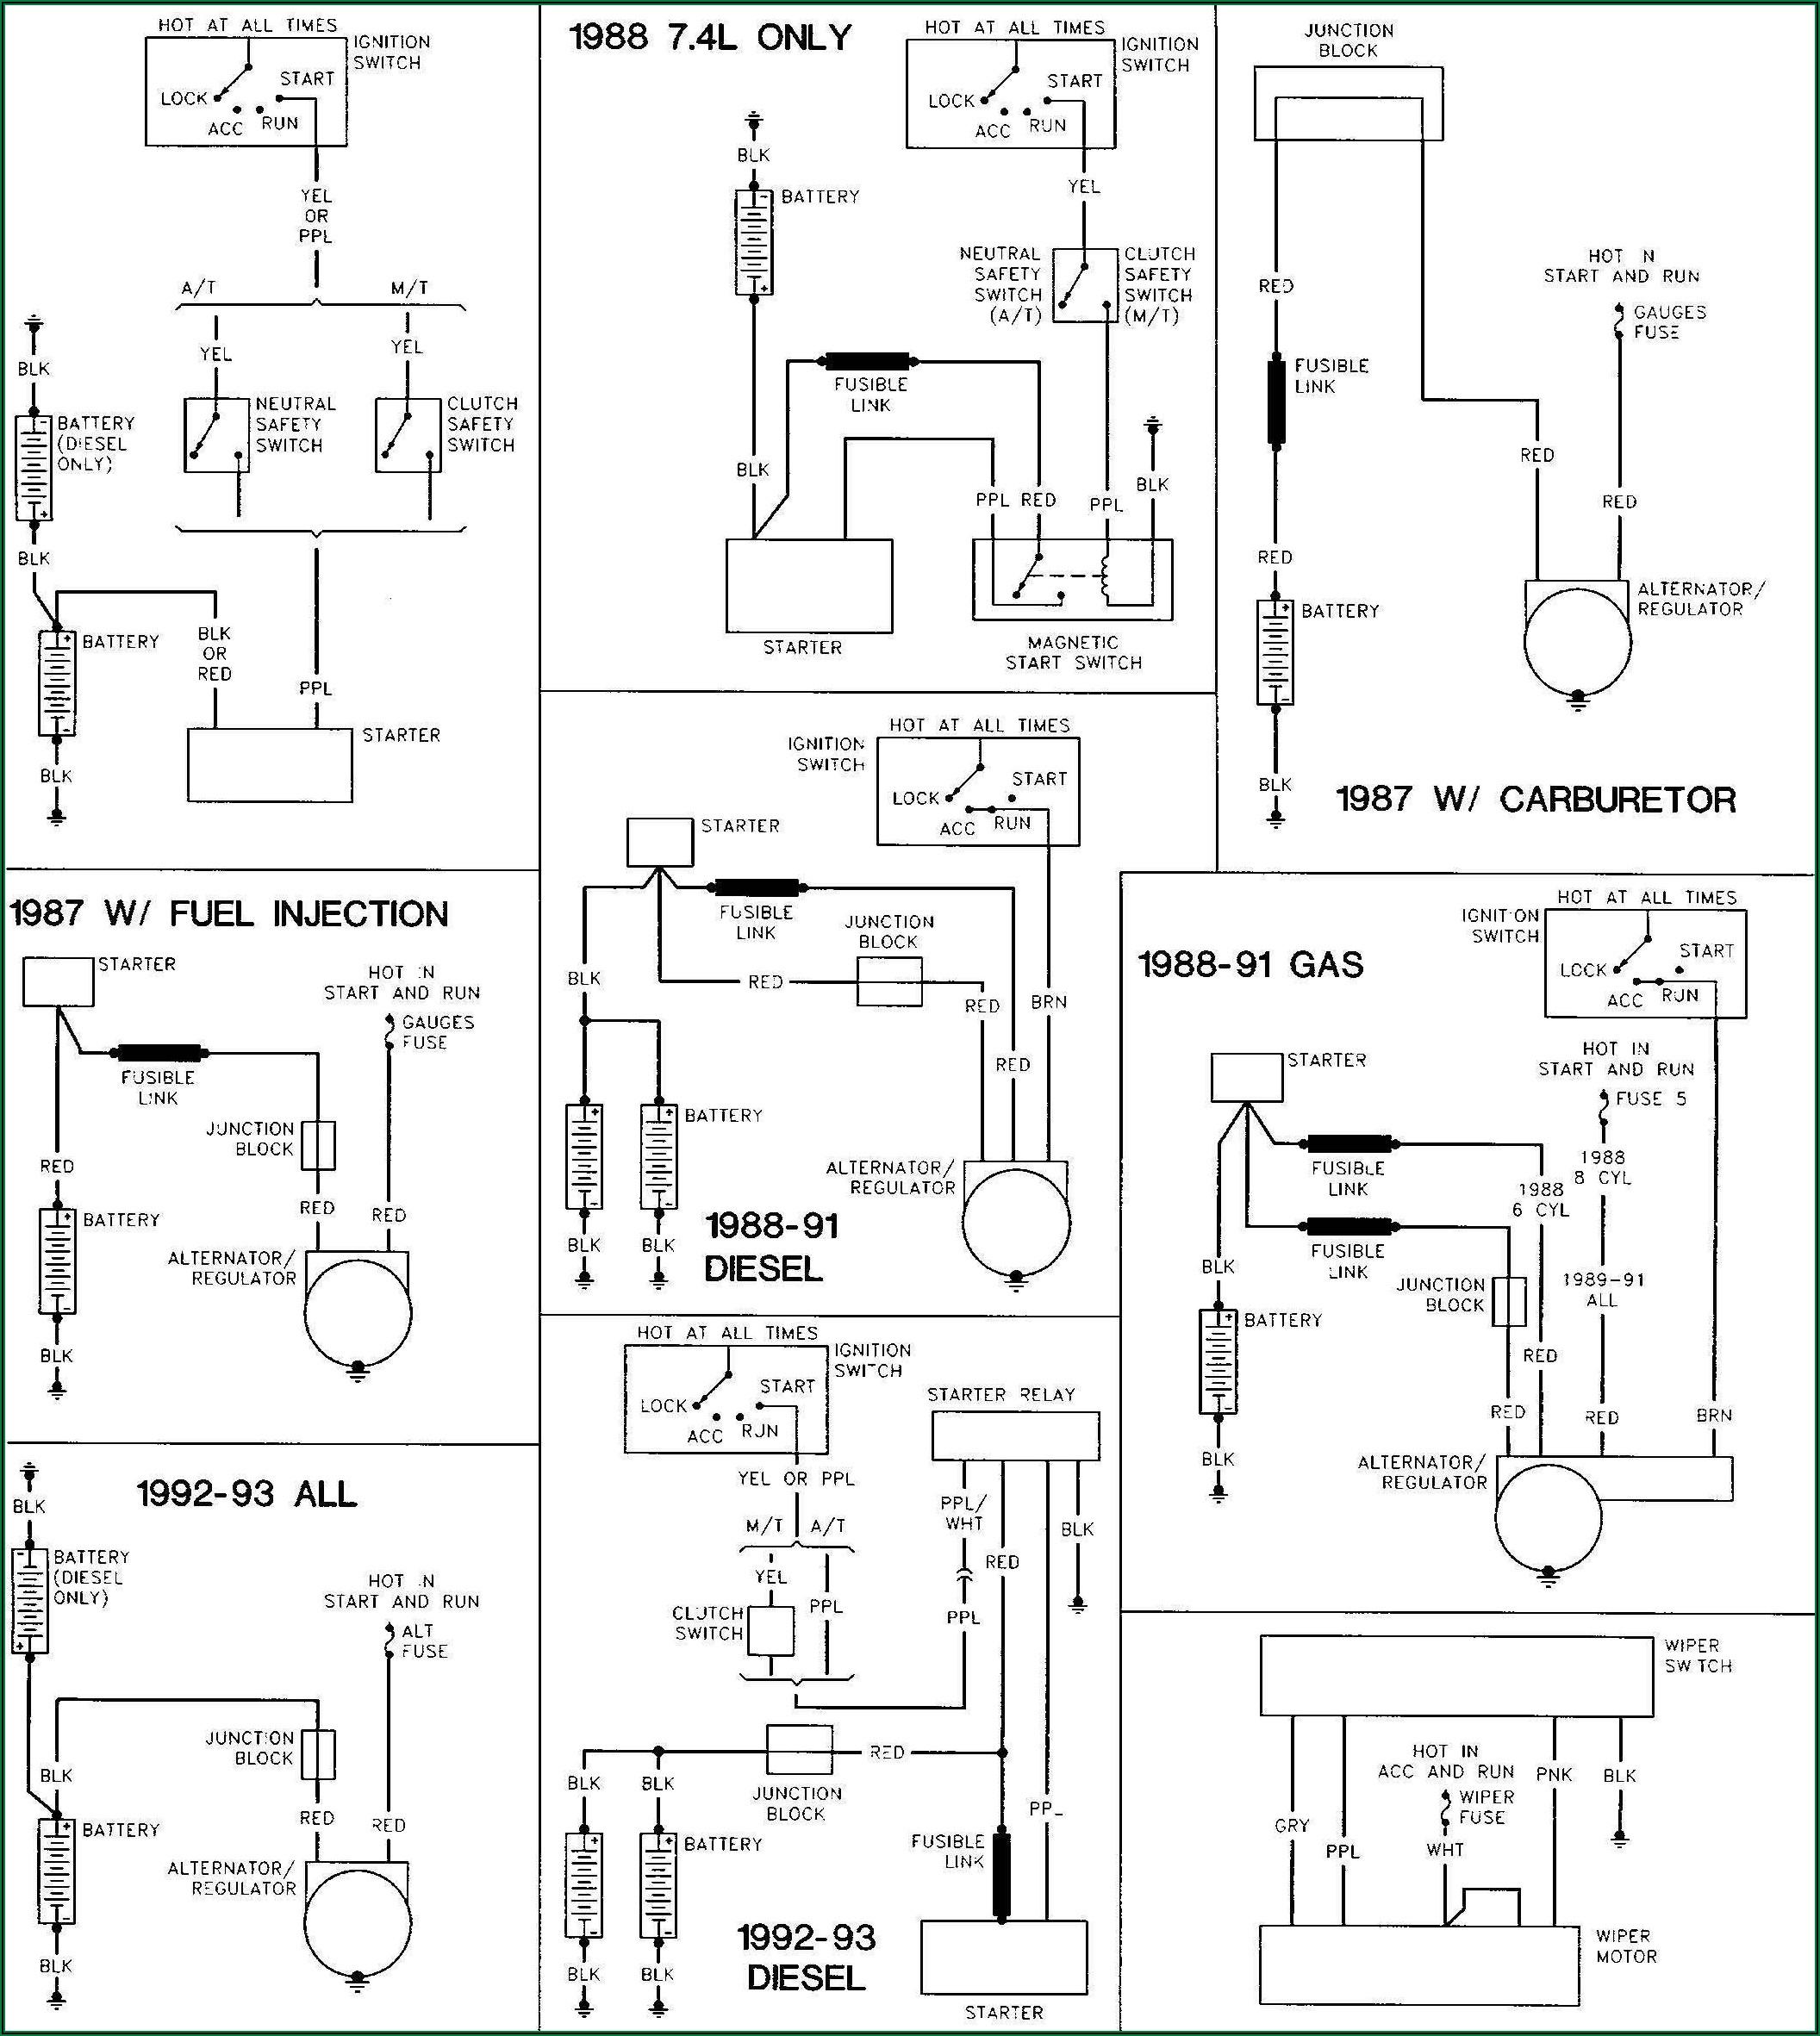 Travel Trailer Electrical Wiring Diagram